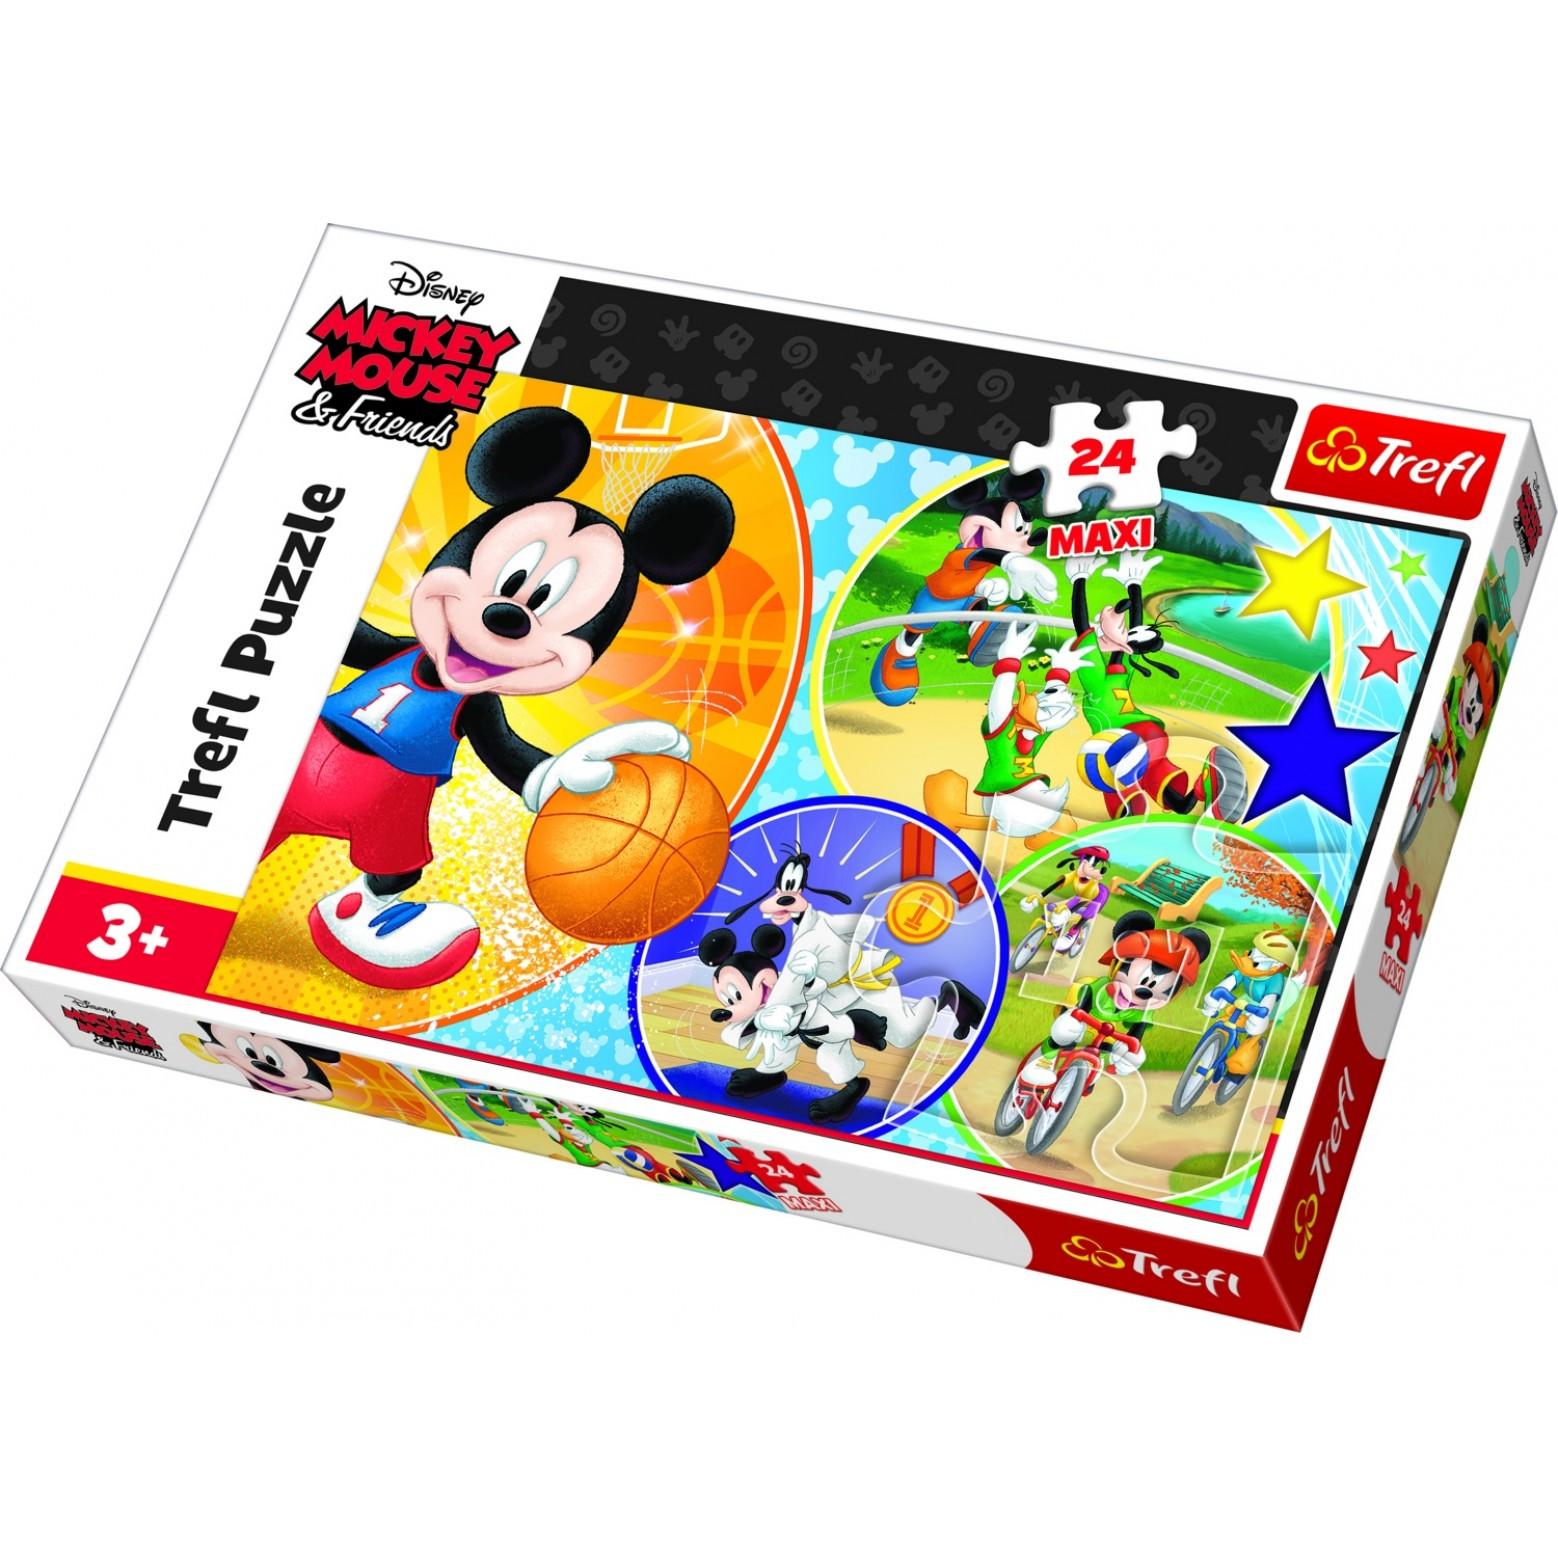 Mickey Mouse puzzel 24 stukjes 3+